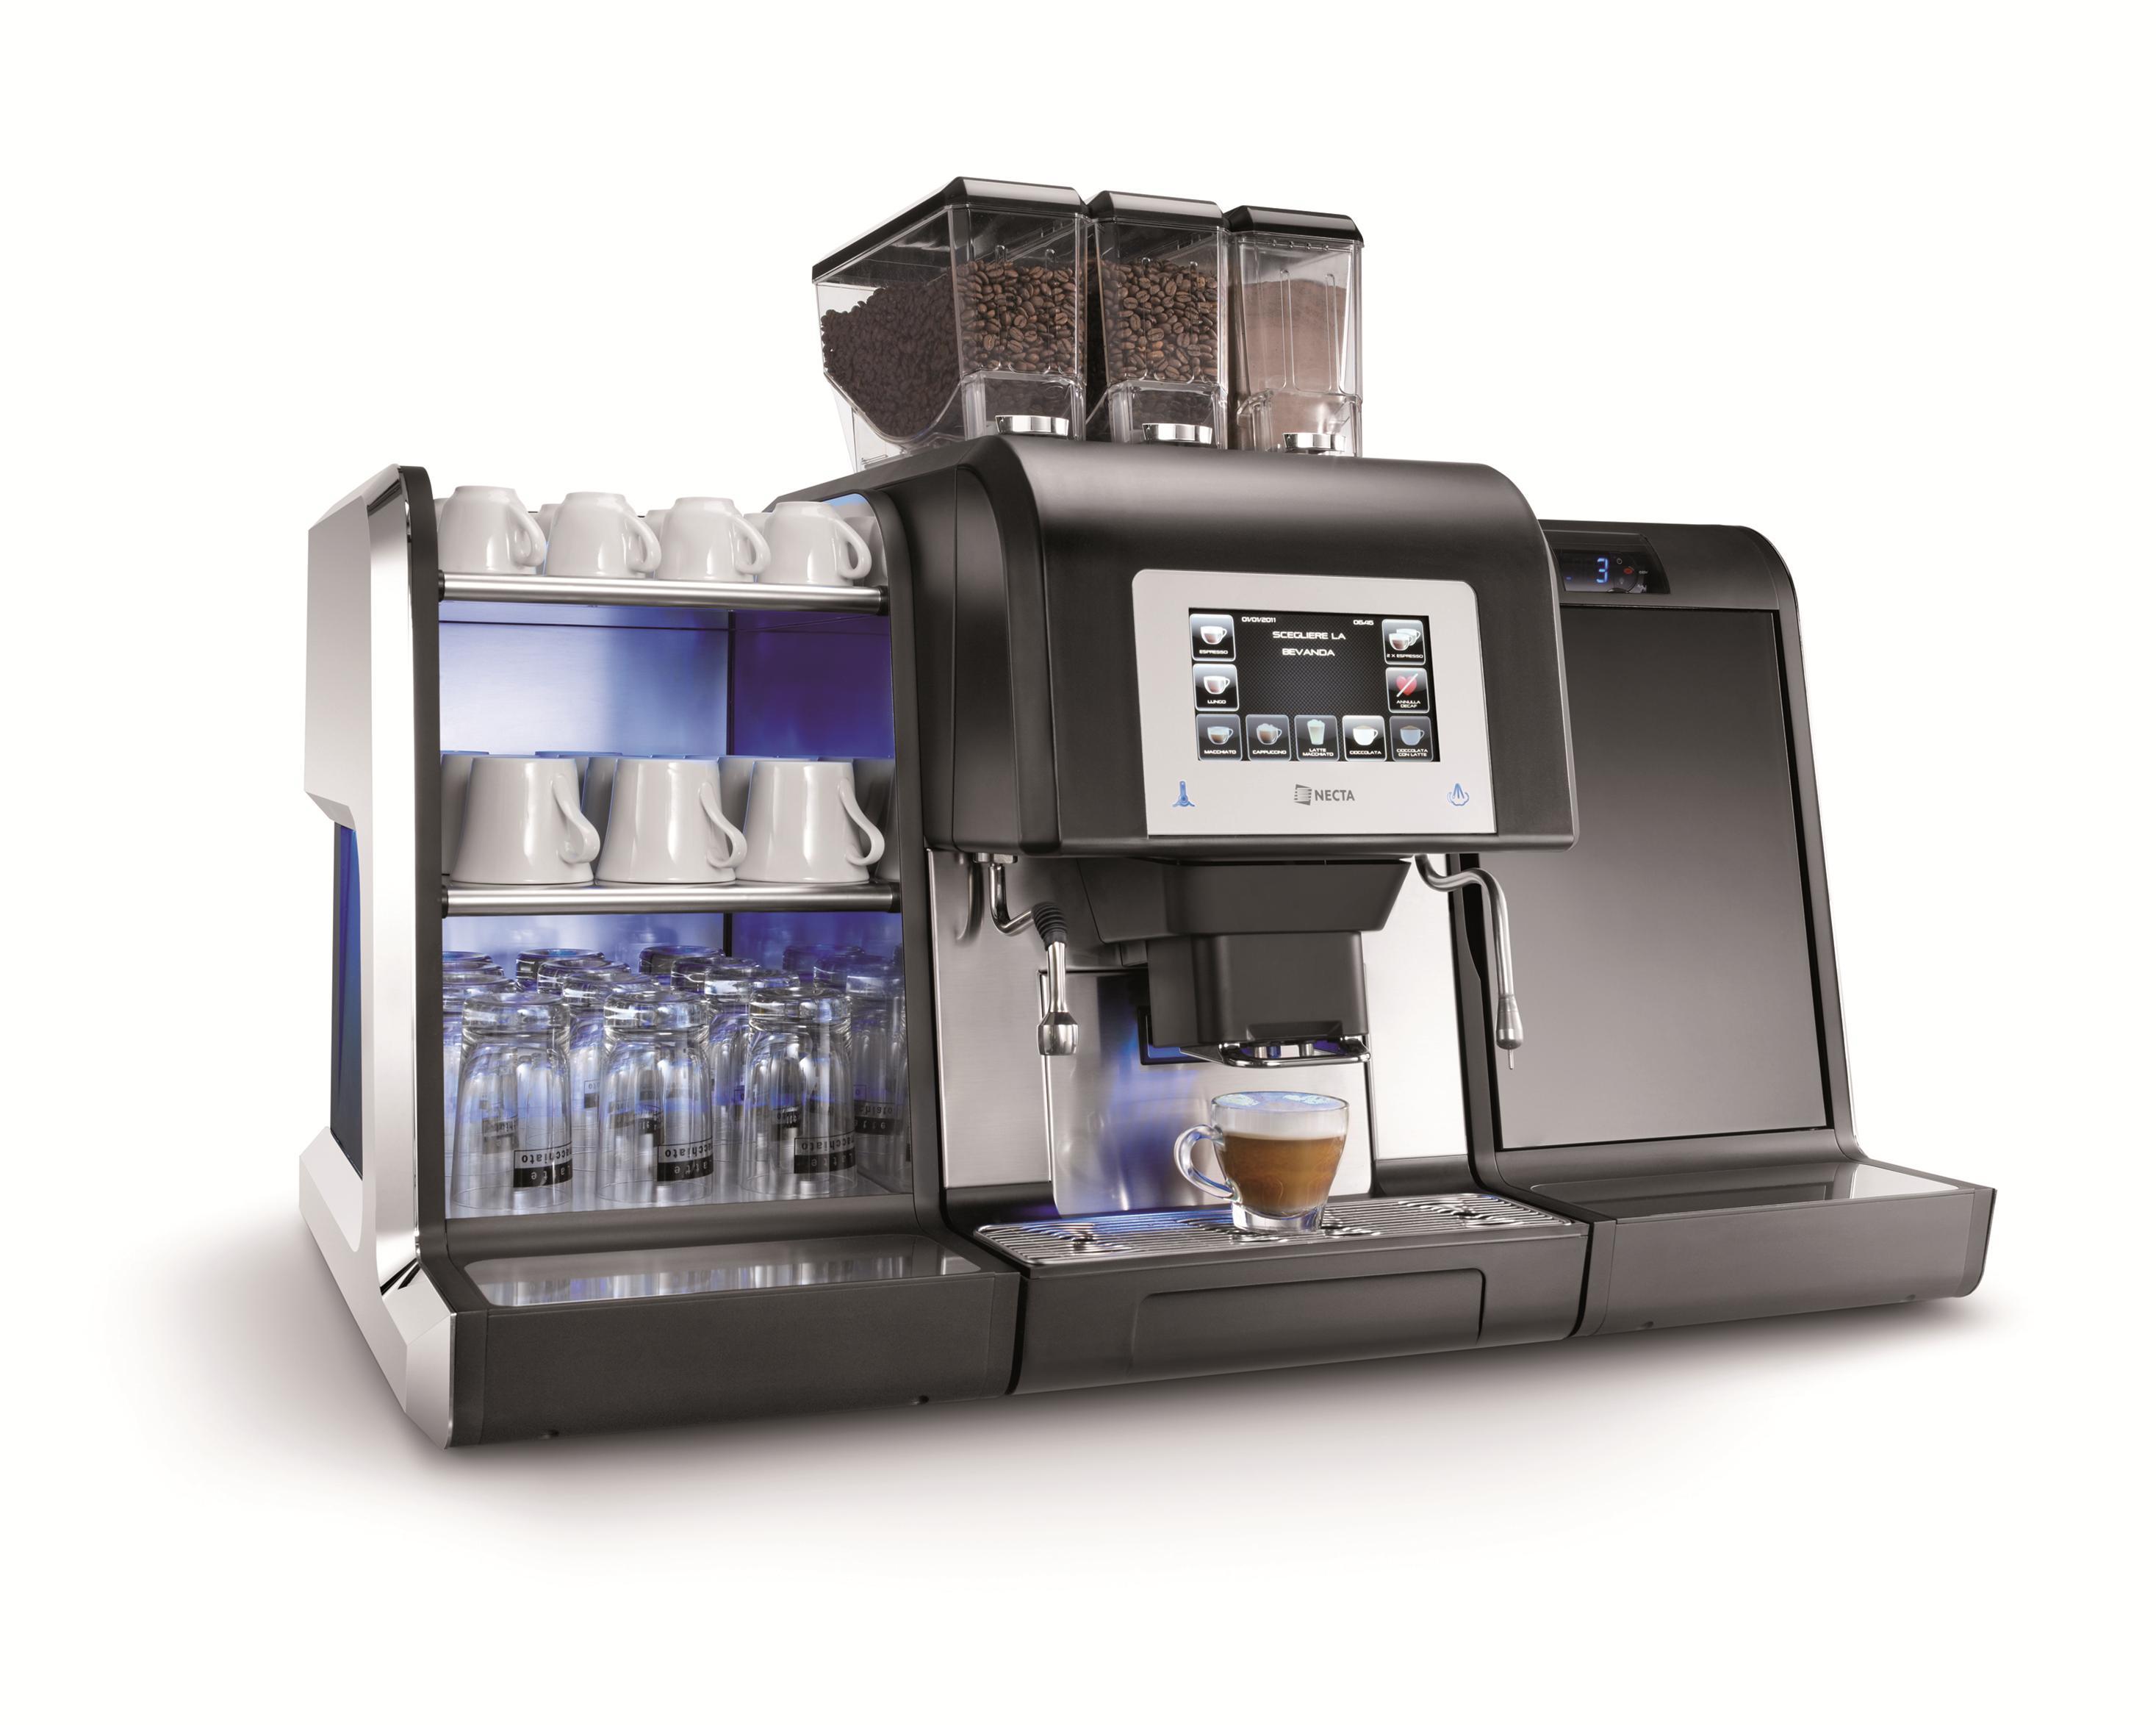 kaffemaskin for bedrift kaffeautomater kaffemaskiner. Black Bedroom Furniture Sets. Home Design Ideas